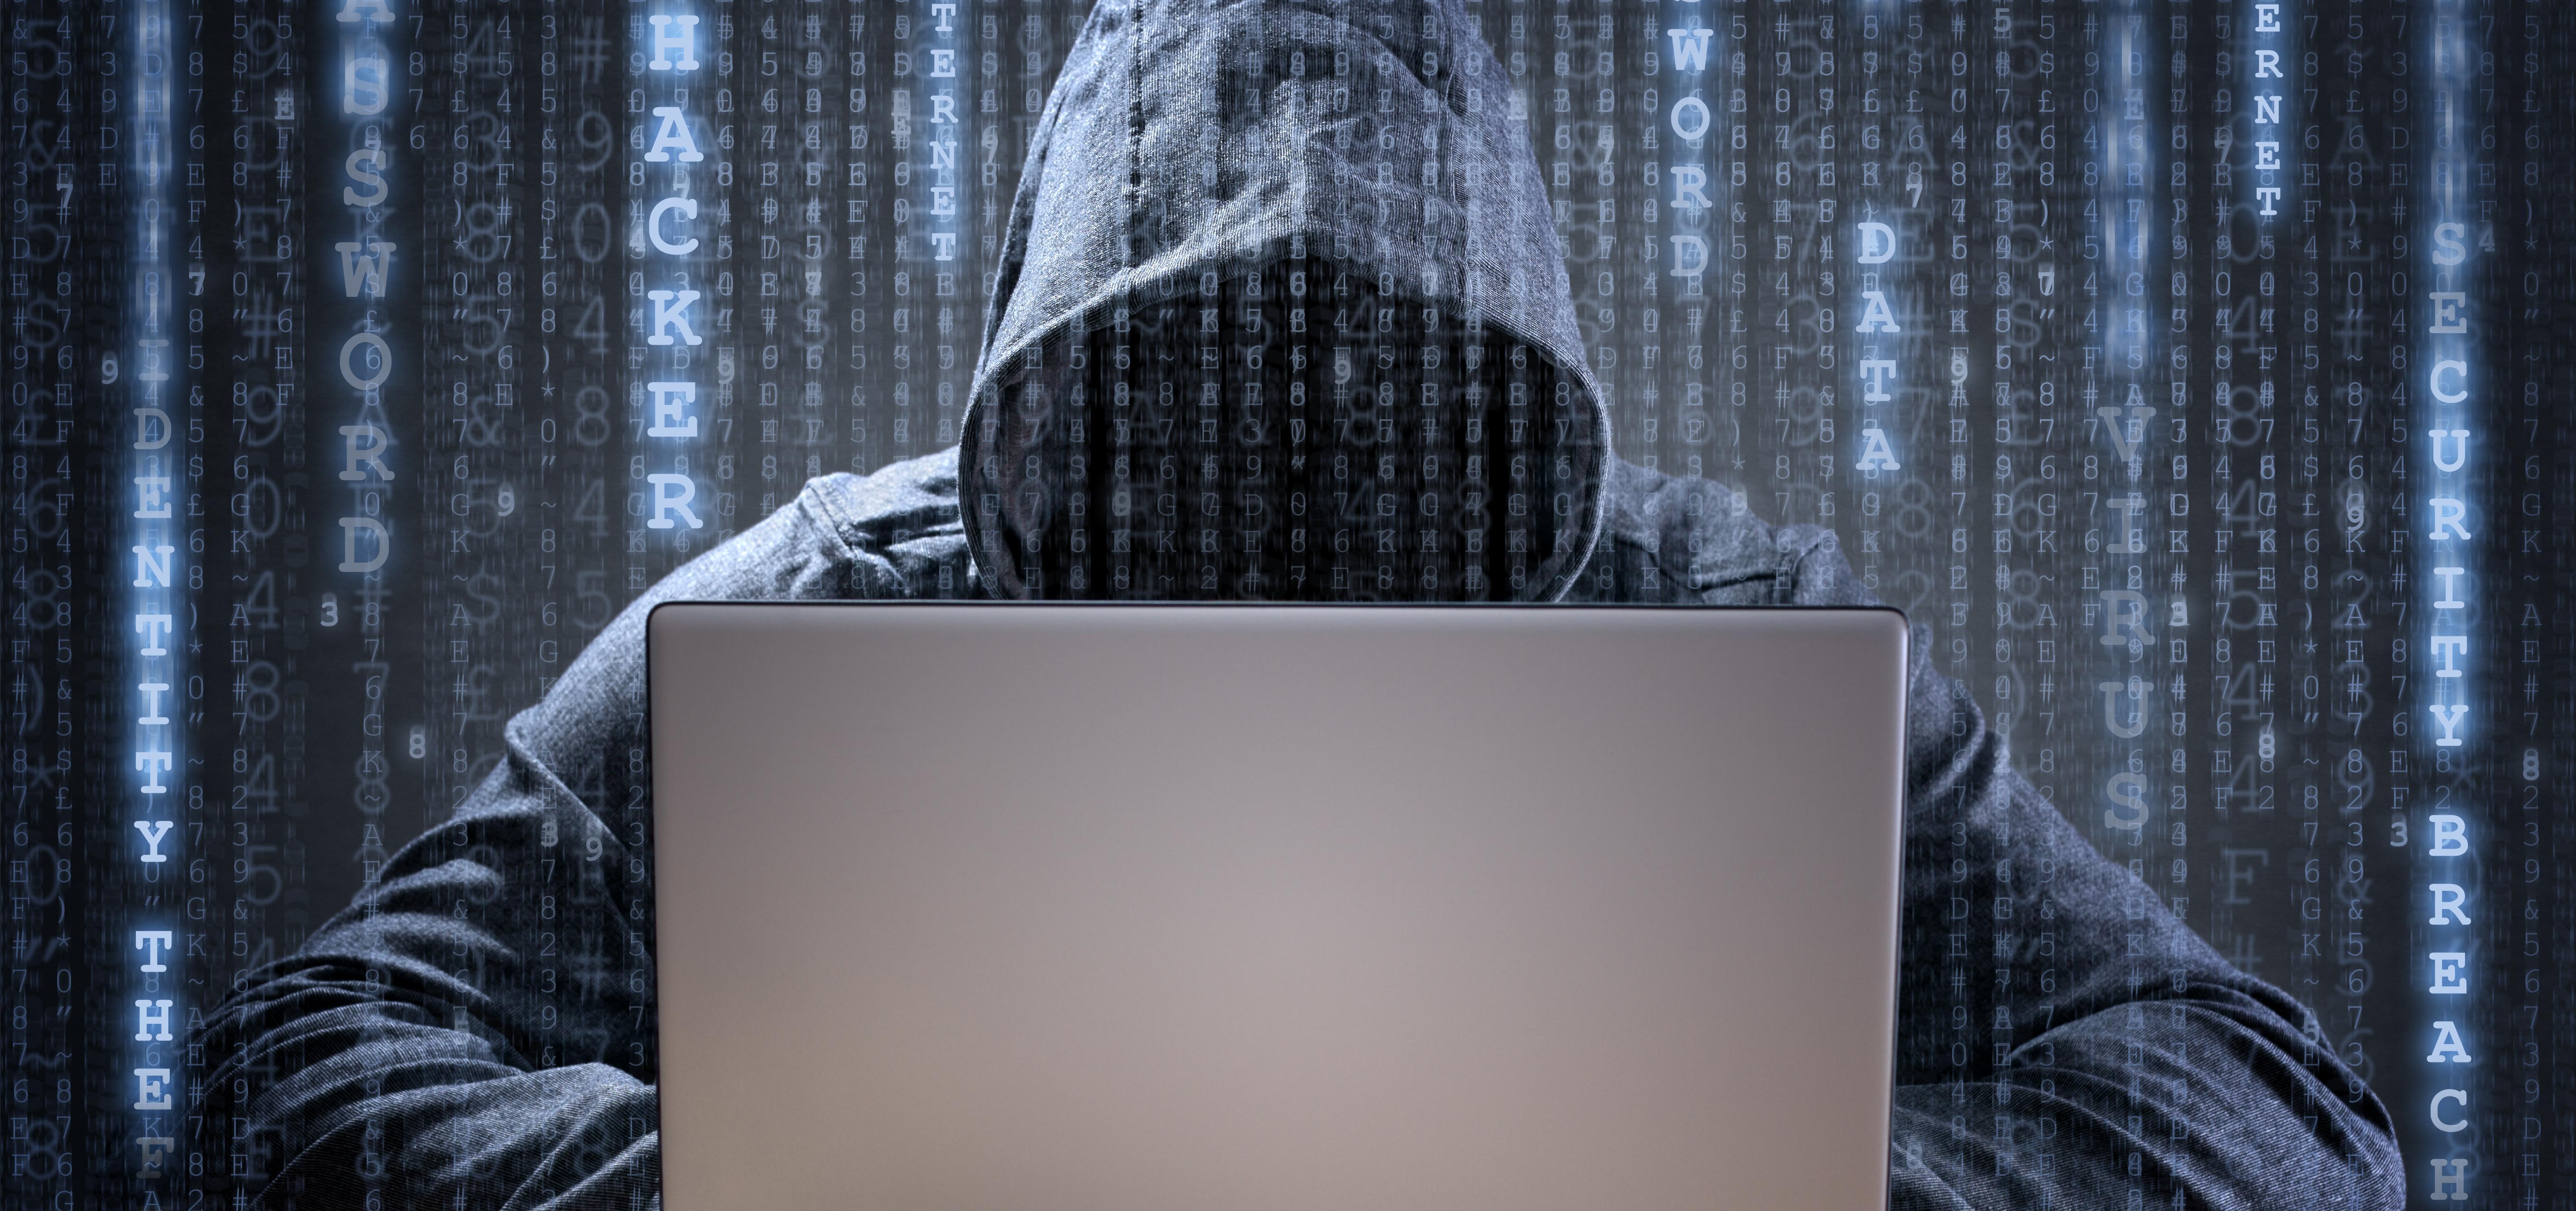 Fondos de pantalla Hacker